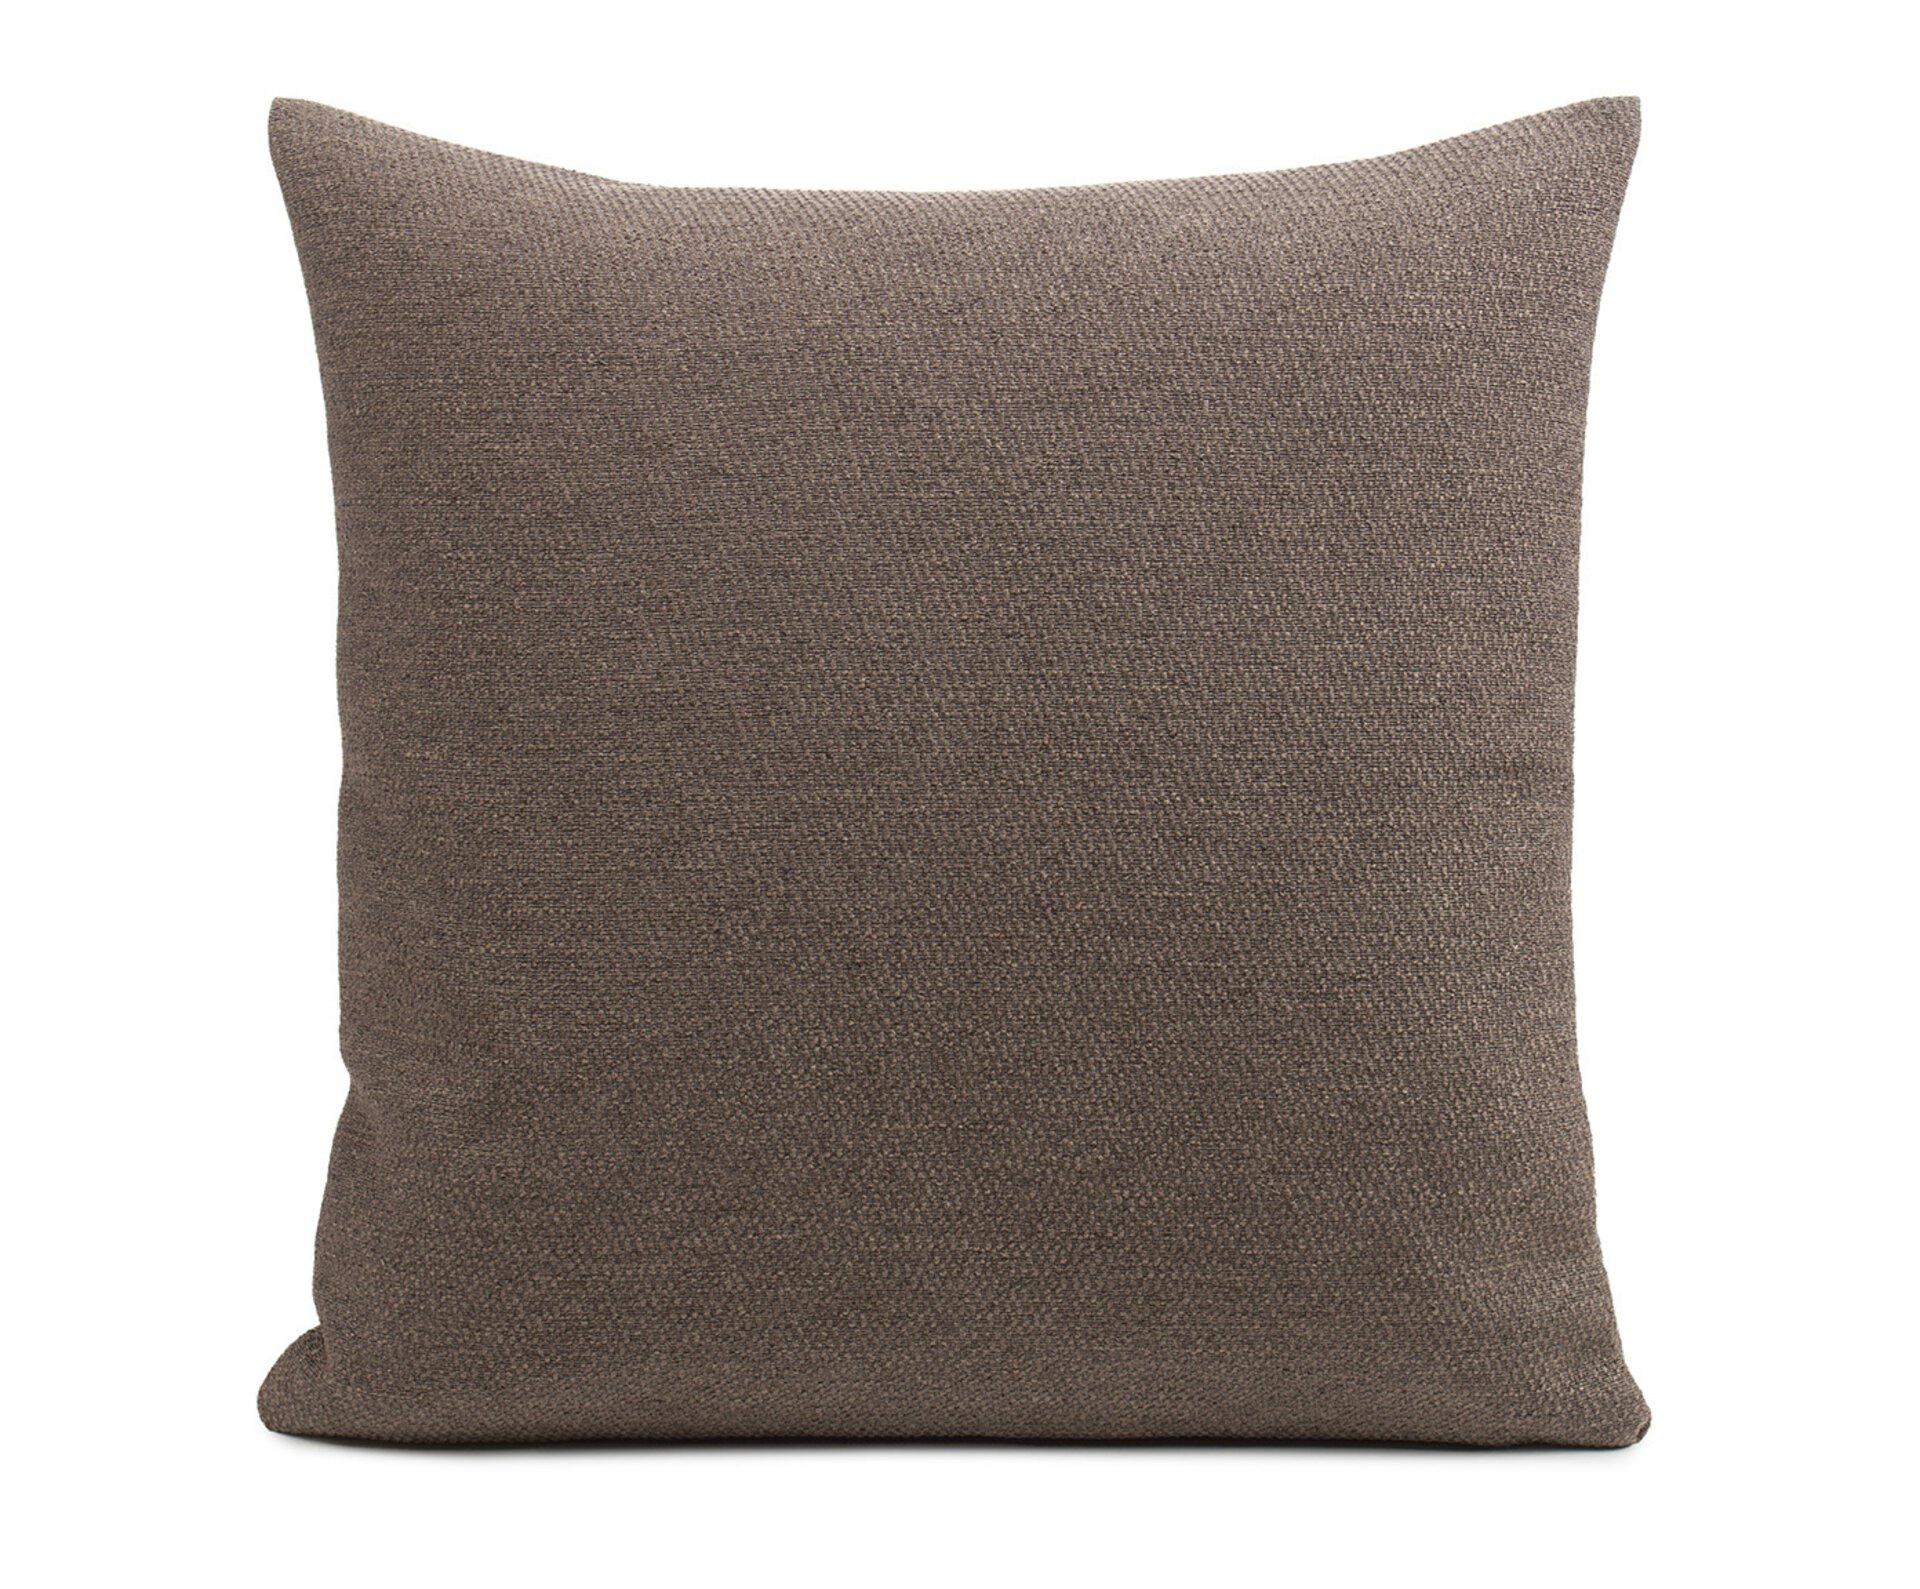 Kissenhülle Fabricio Ambiente Trendlife Textil braun 50 x 50 cm